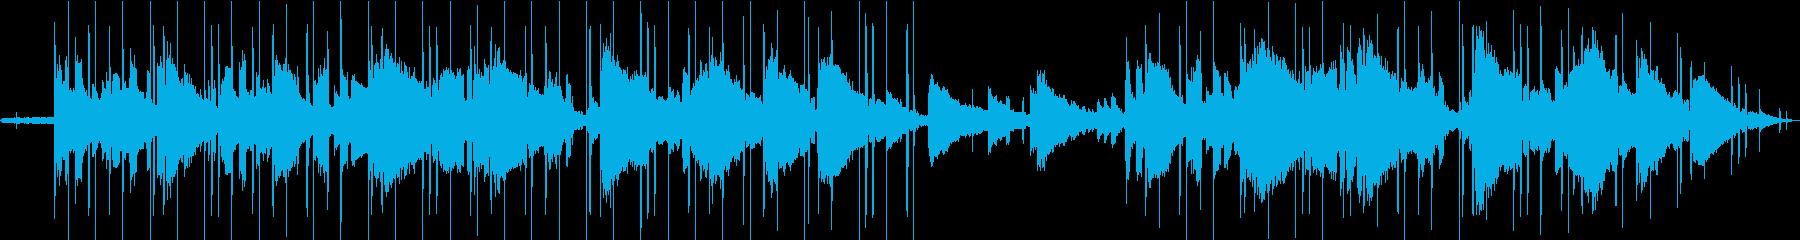 Lofi Hiphop/夜カフェ系ビートの再生済みの波形